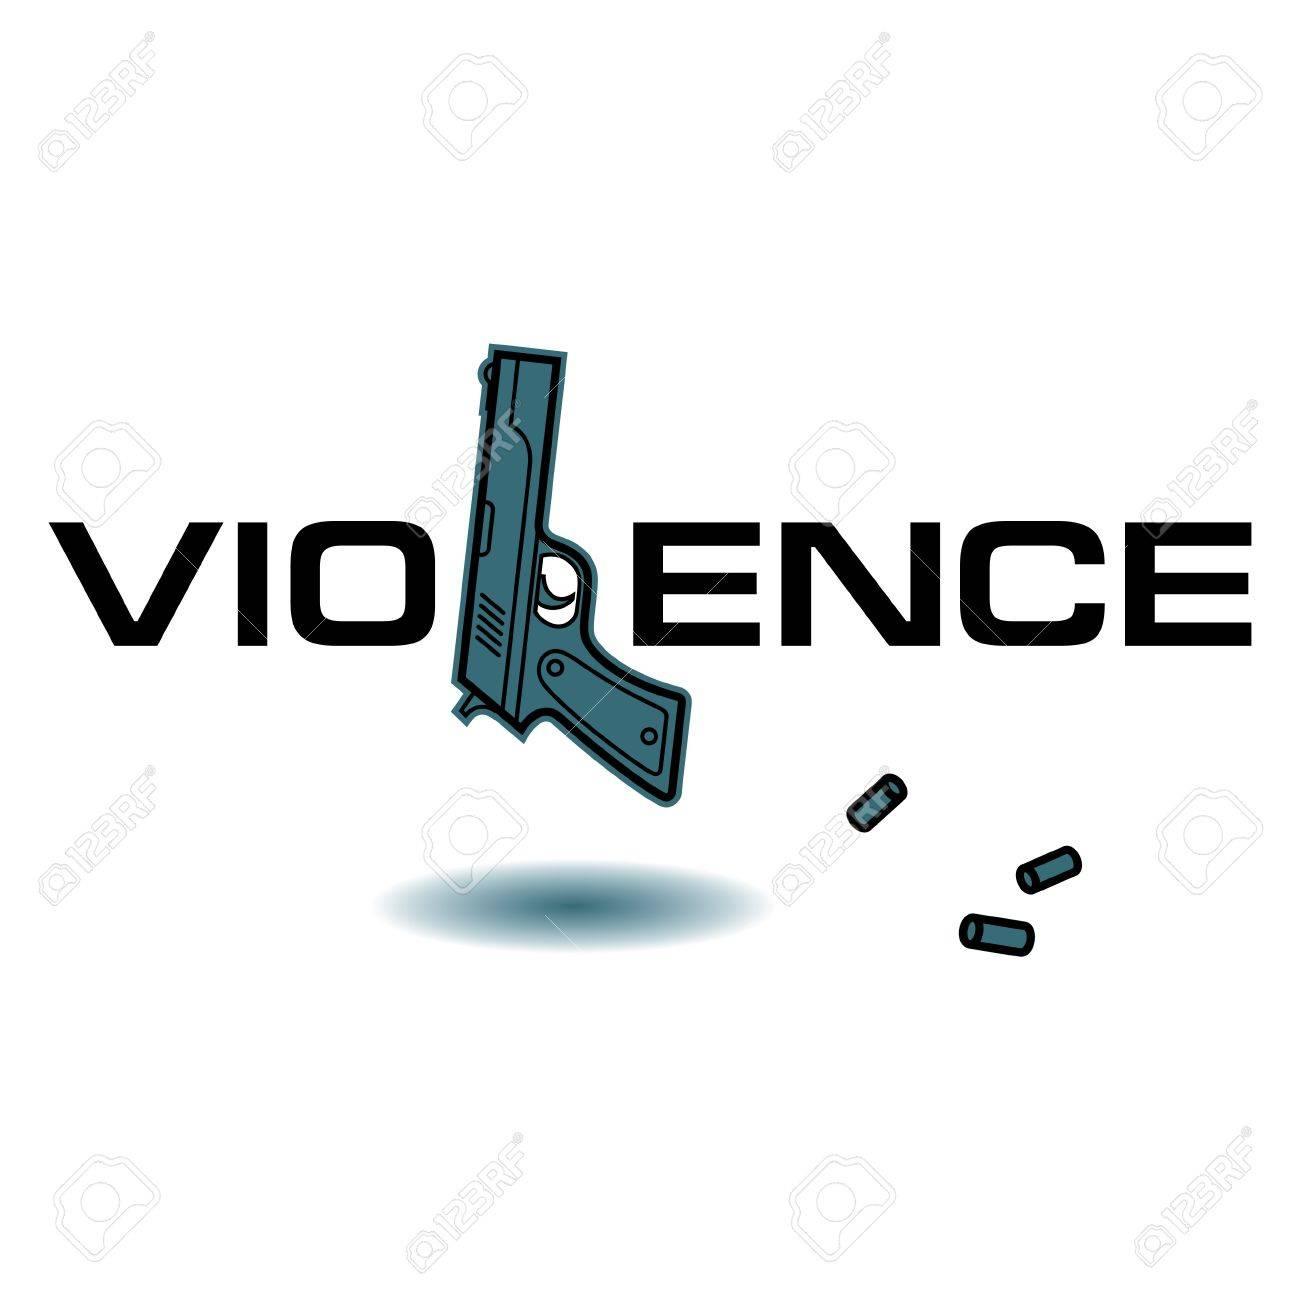 Violence crime killing gun weapon bullets pistol royalty free violence crime killing gun weapon bullets pistol stock vector 18063012 buycottarizona